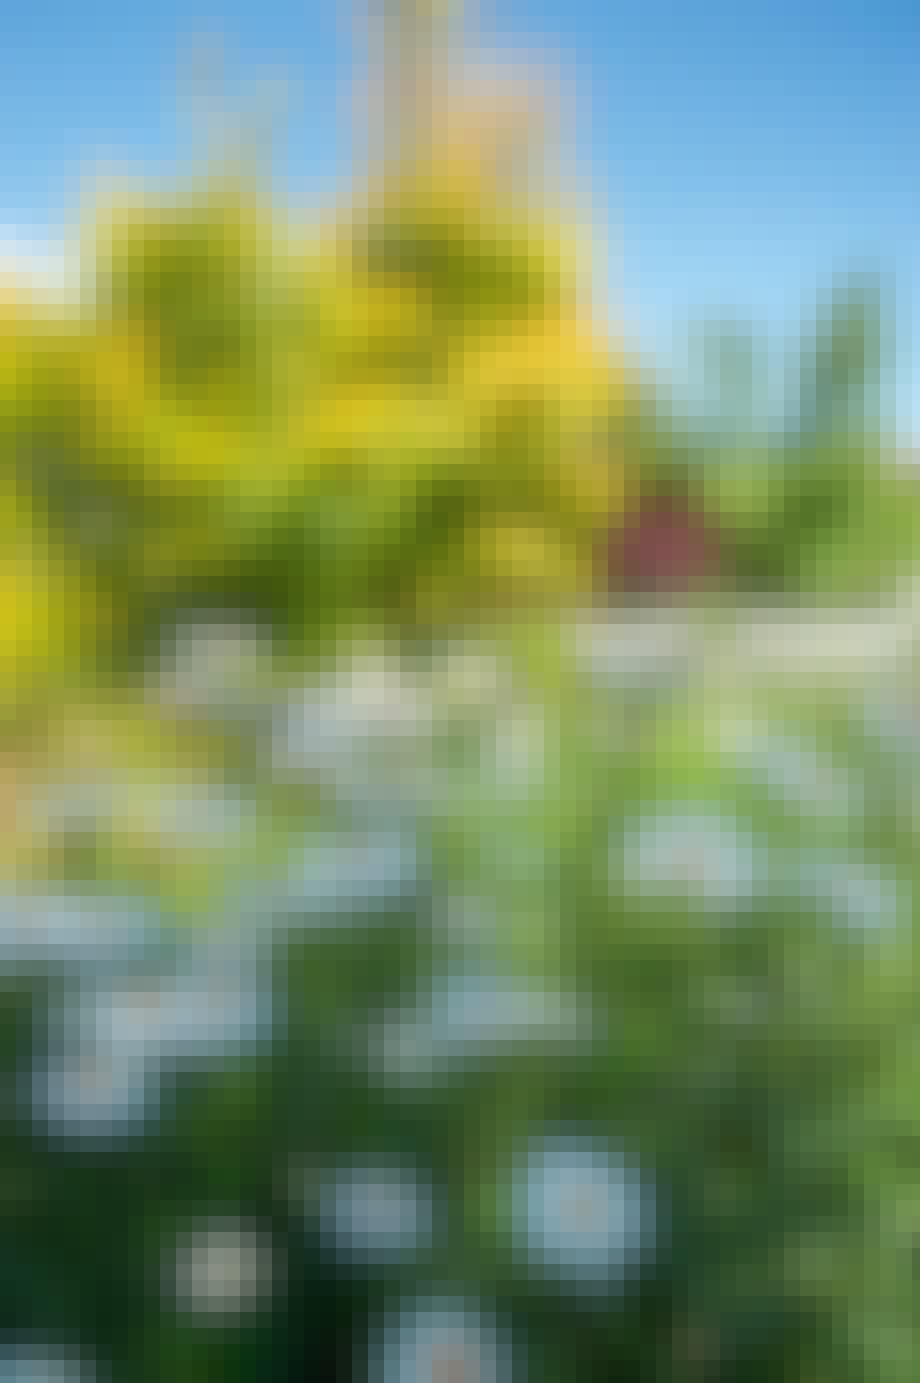 grøftkandsbed stauder hvide margueritter